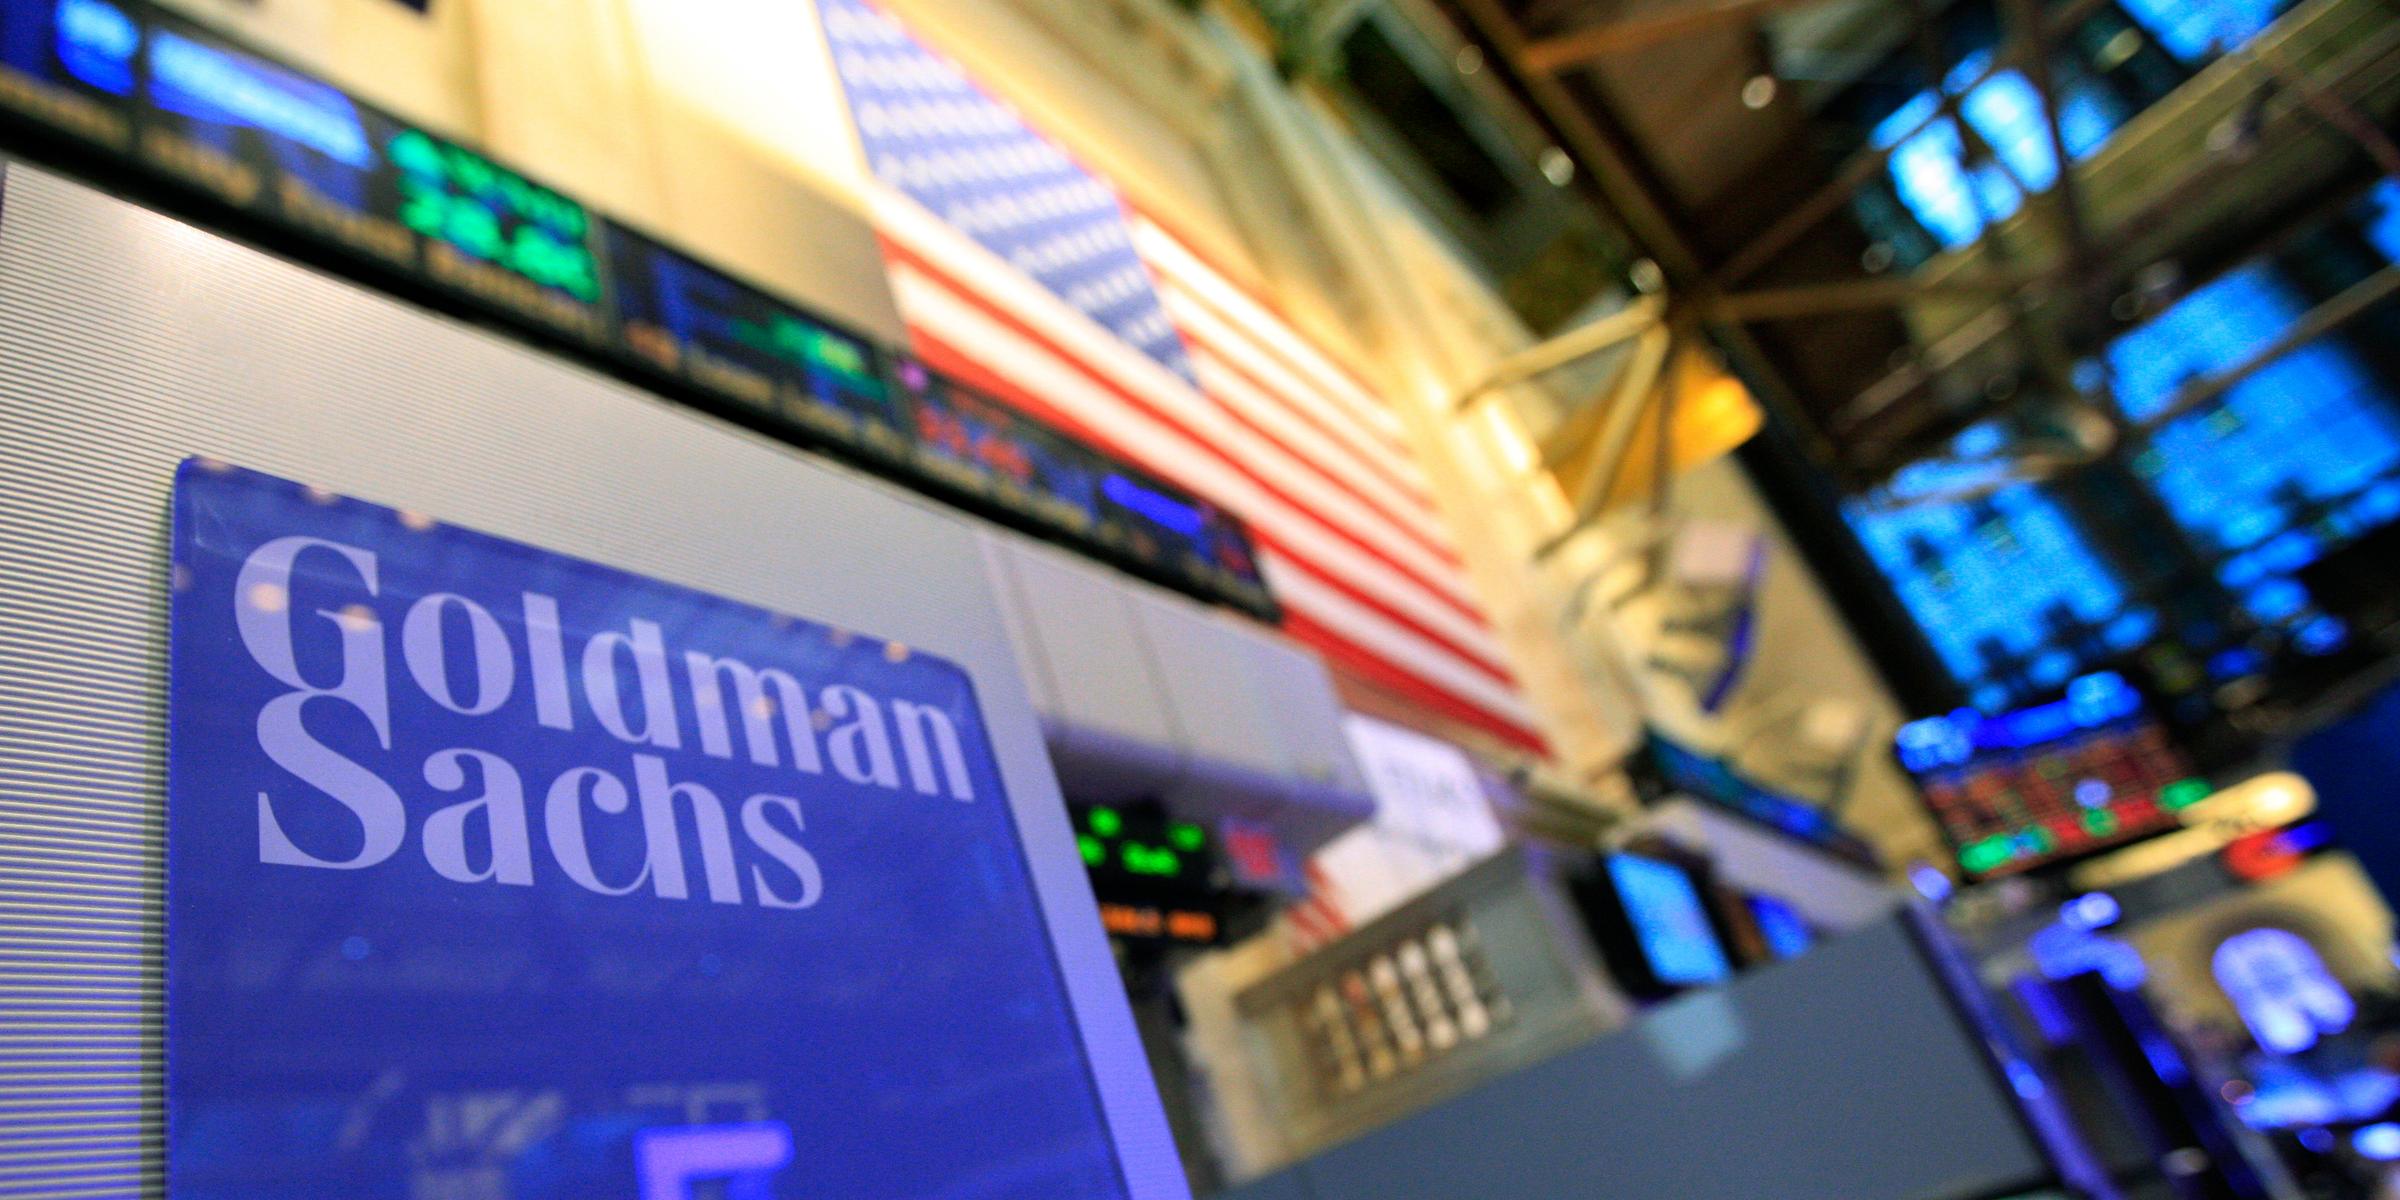 The 'bull market will soon end' Goldman Sachs warns